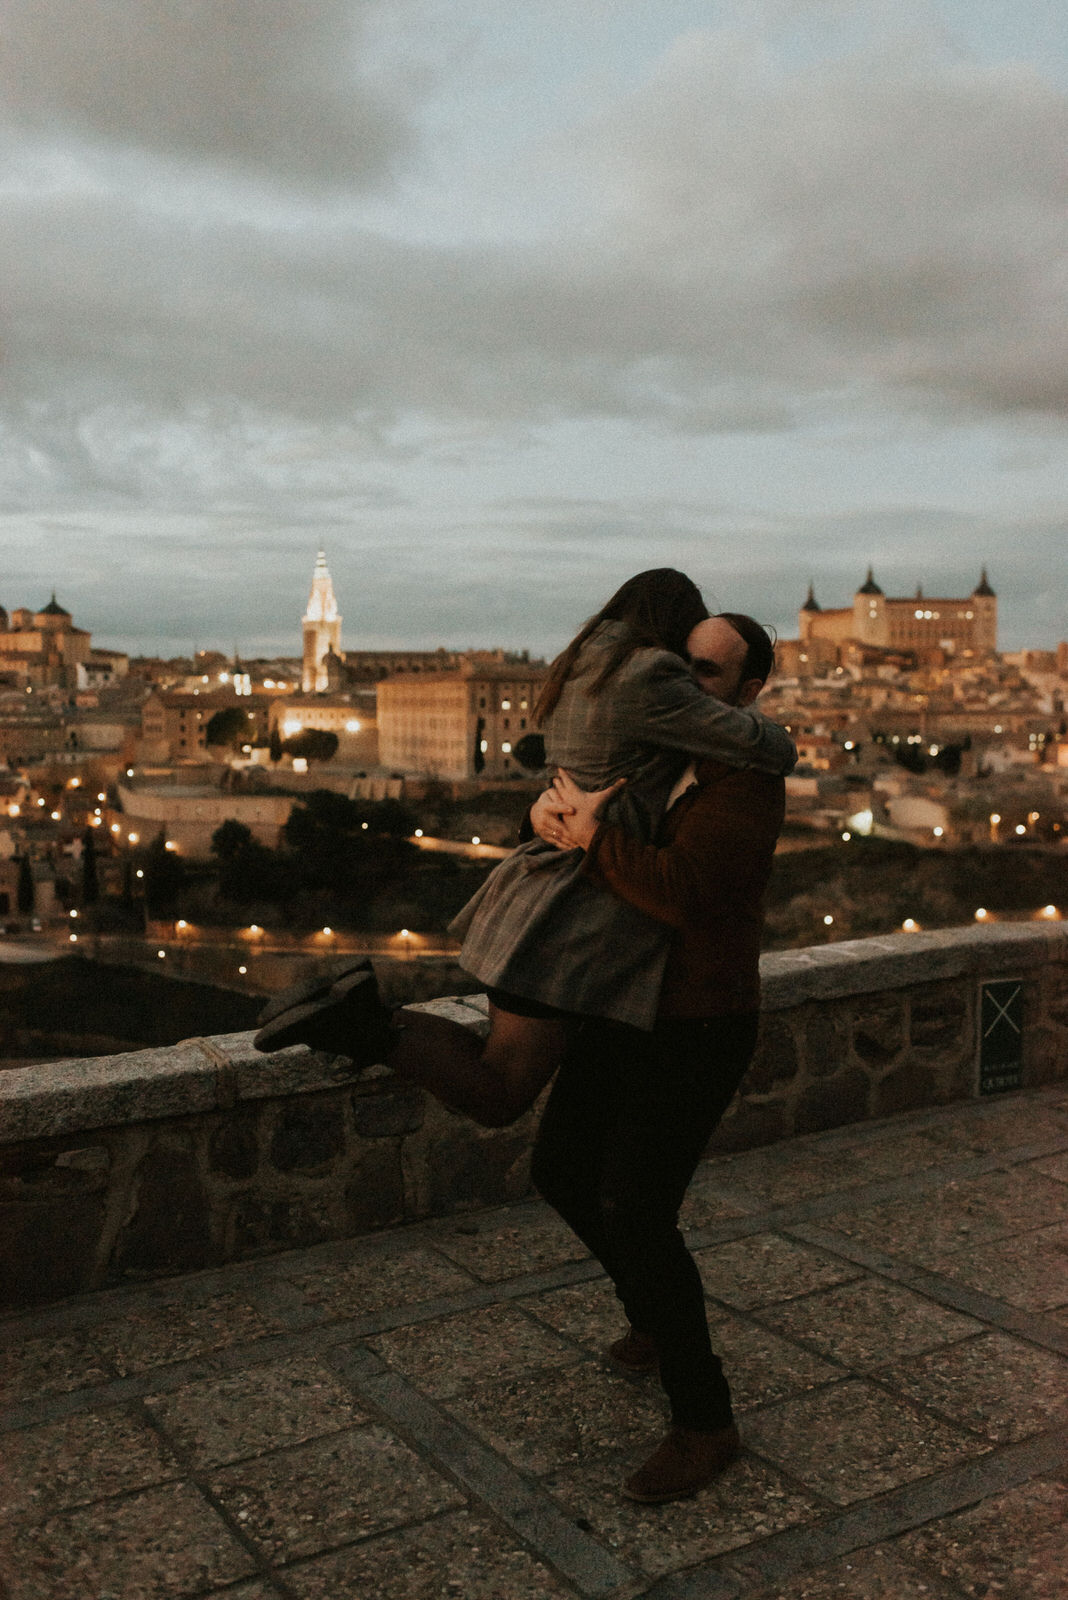 A love story written in Toledo by Sorin & Patricia